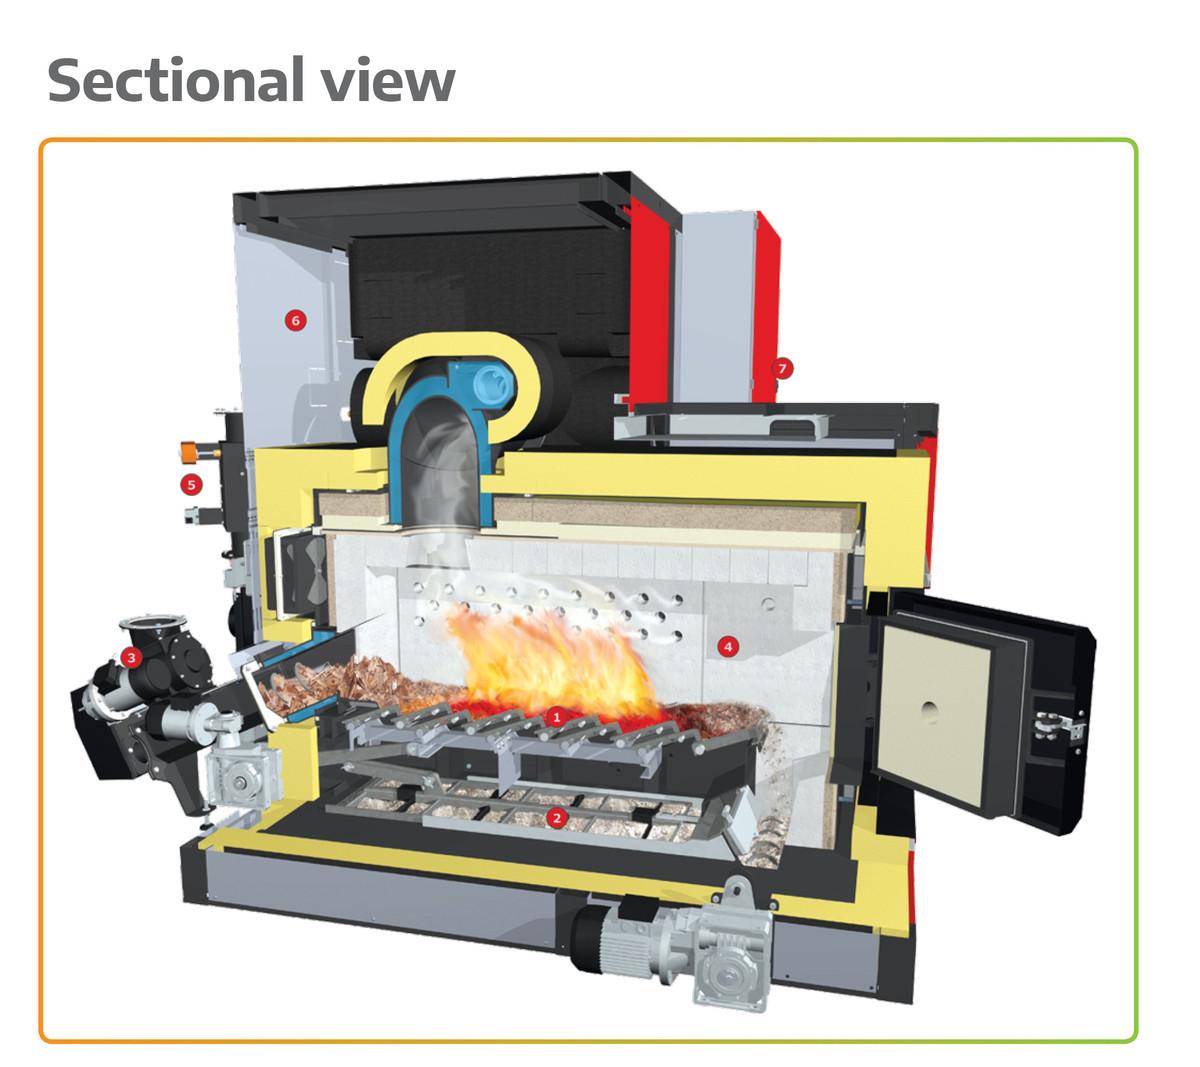 Inside Froling TI 350 biomass boiler